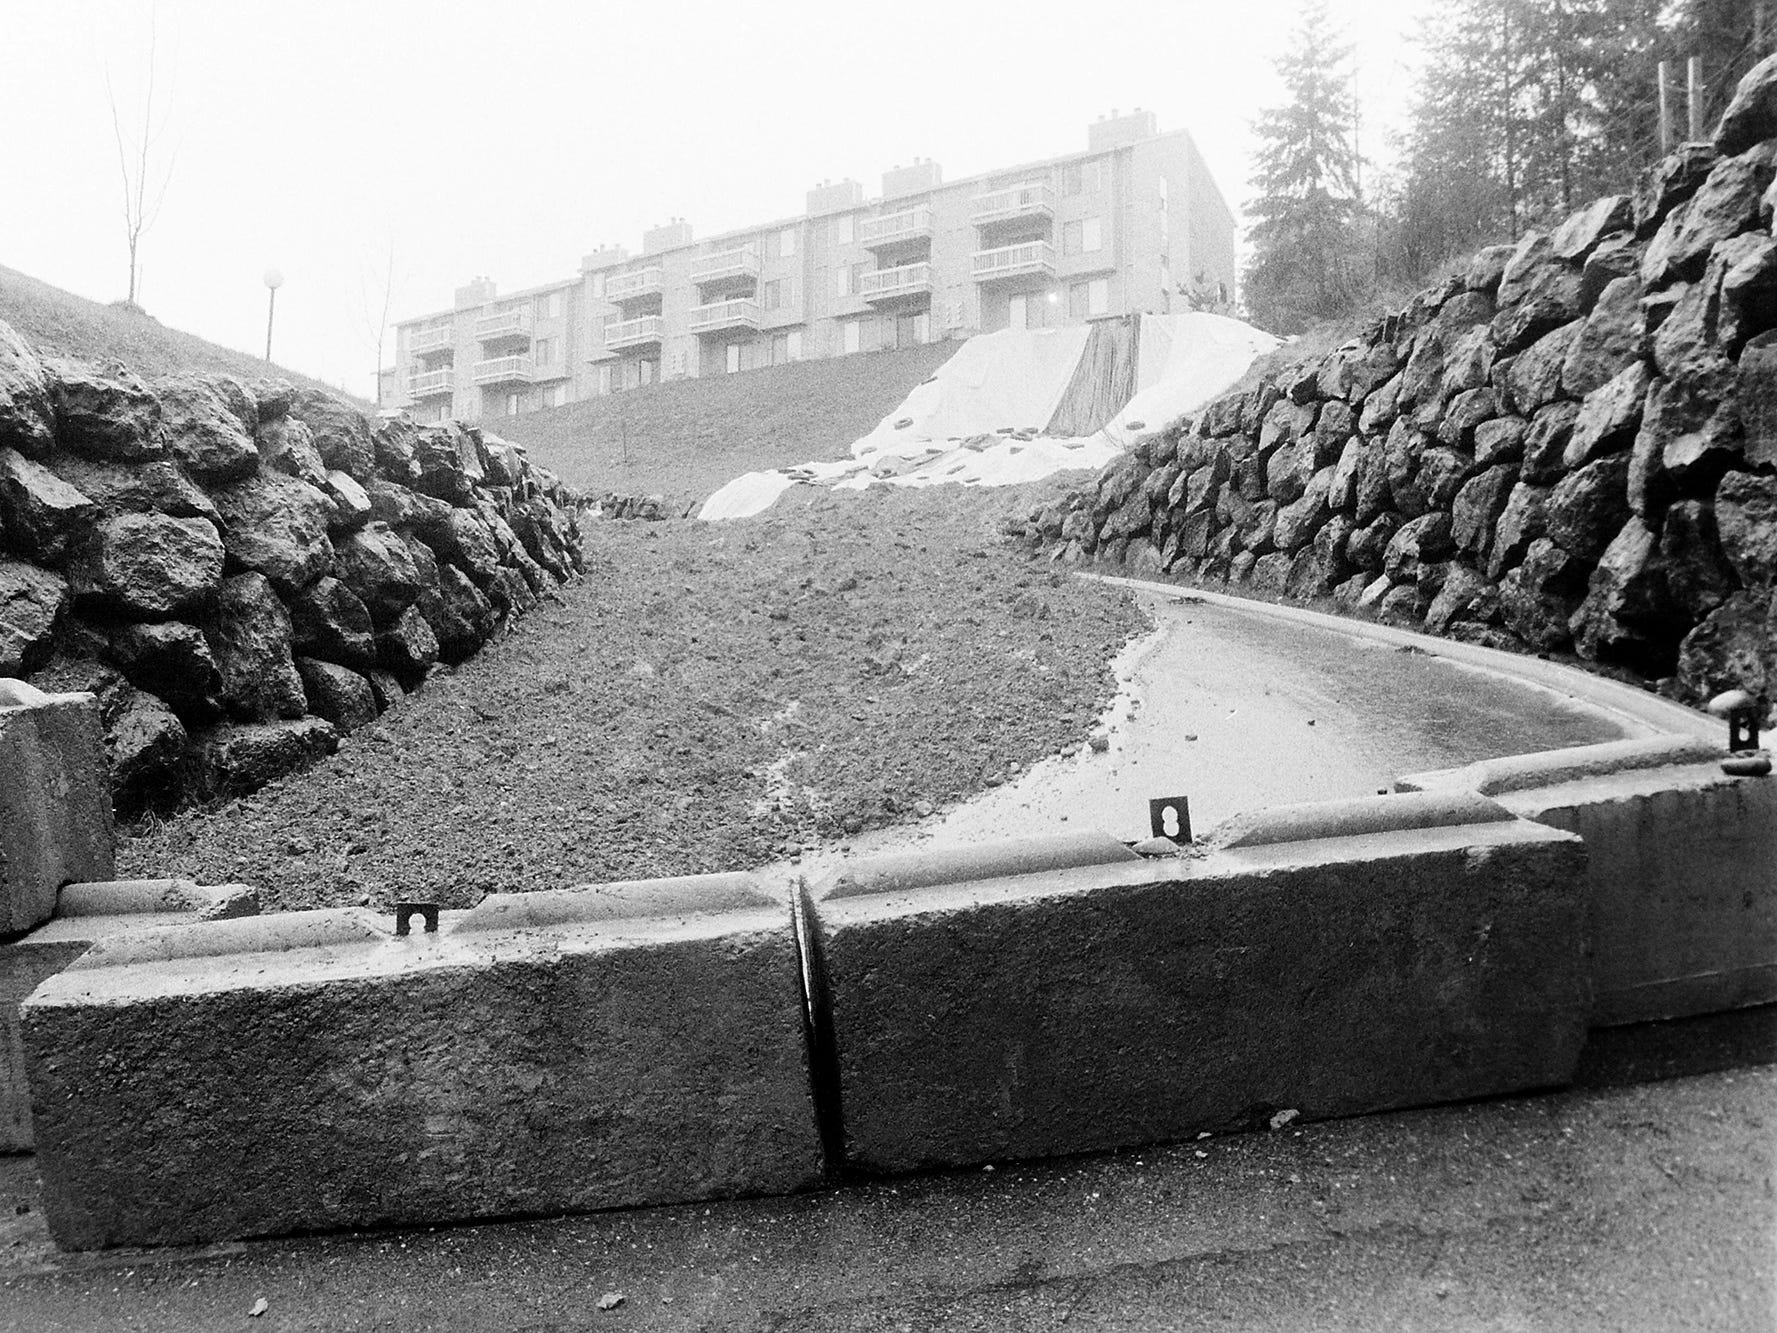 01/23/86Mudslide